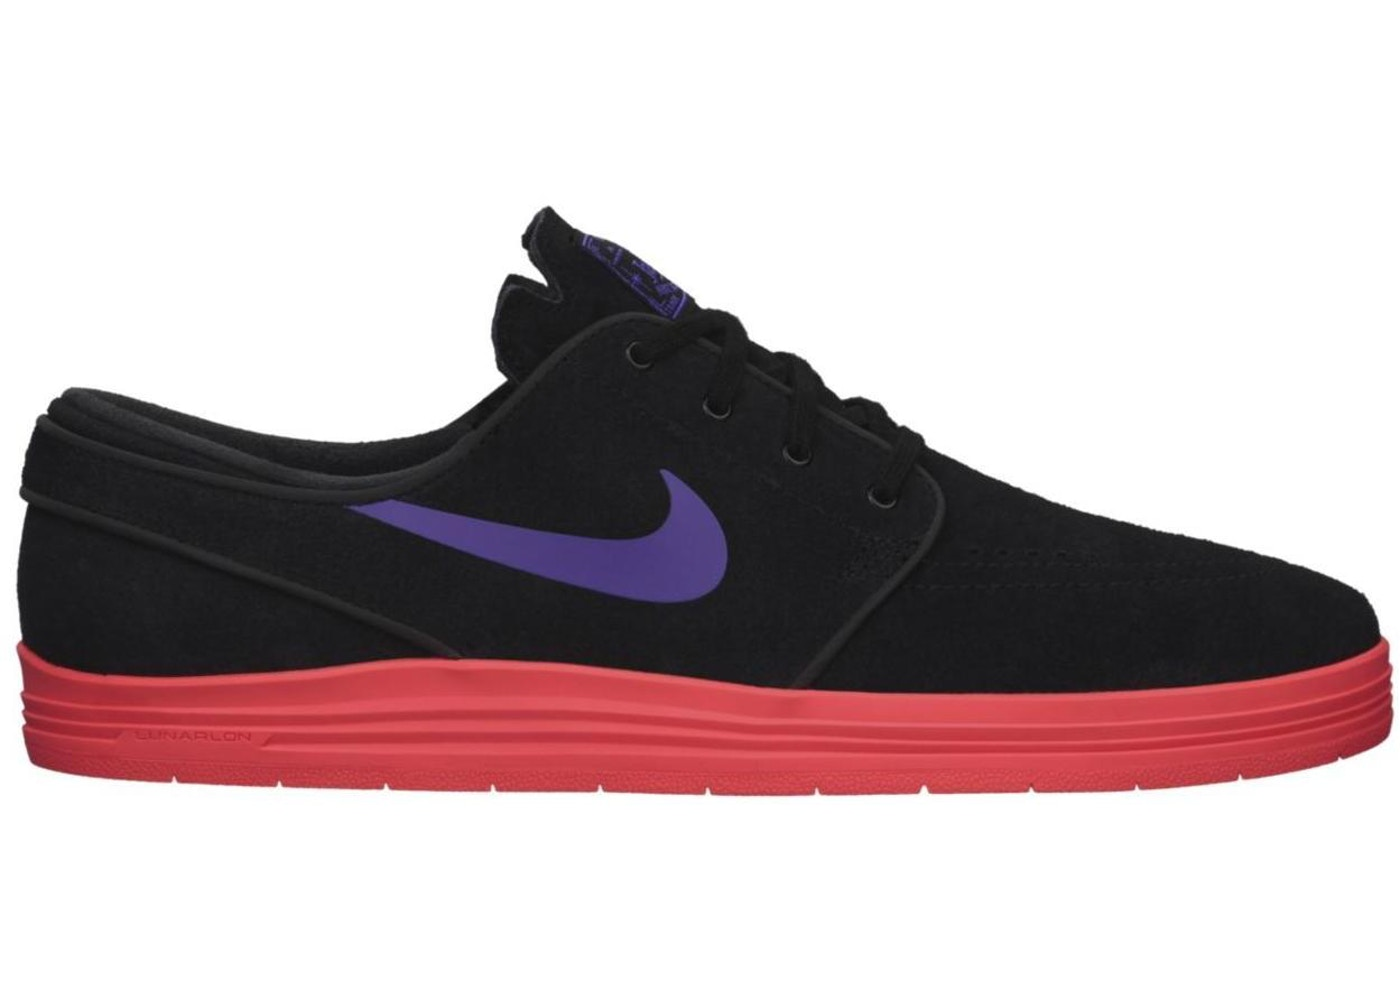 uk availability 6eaf3 fba9d Sell. or Ask. Size 9. View All Bids. Nike SB Stefan Janoski Lunar Hyper  Grape